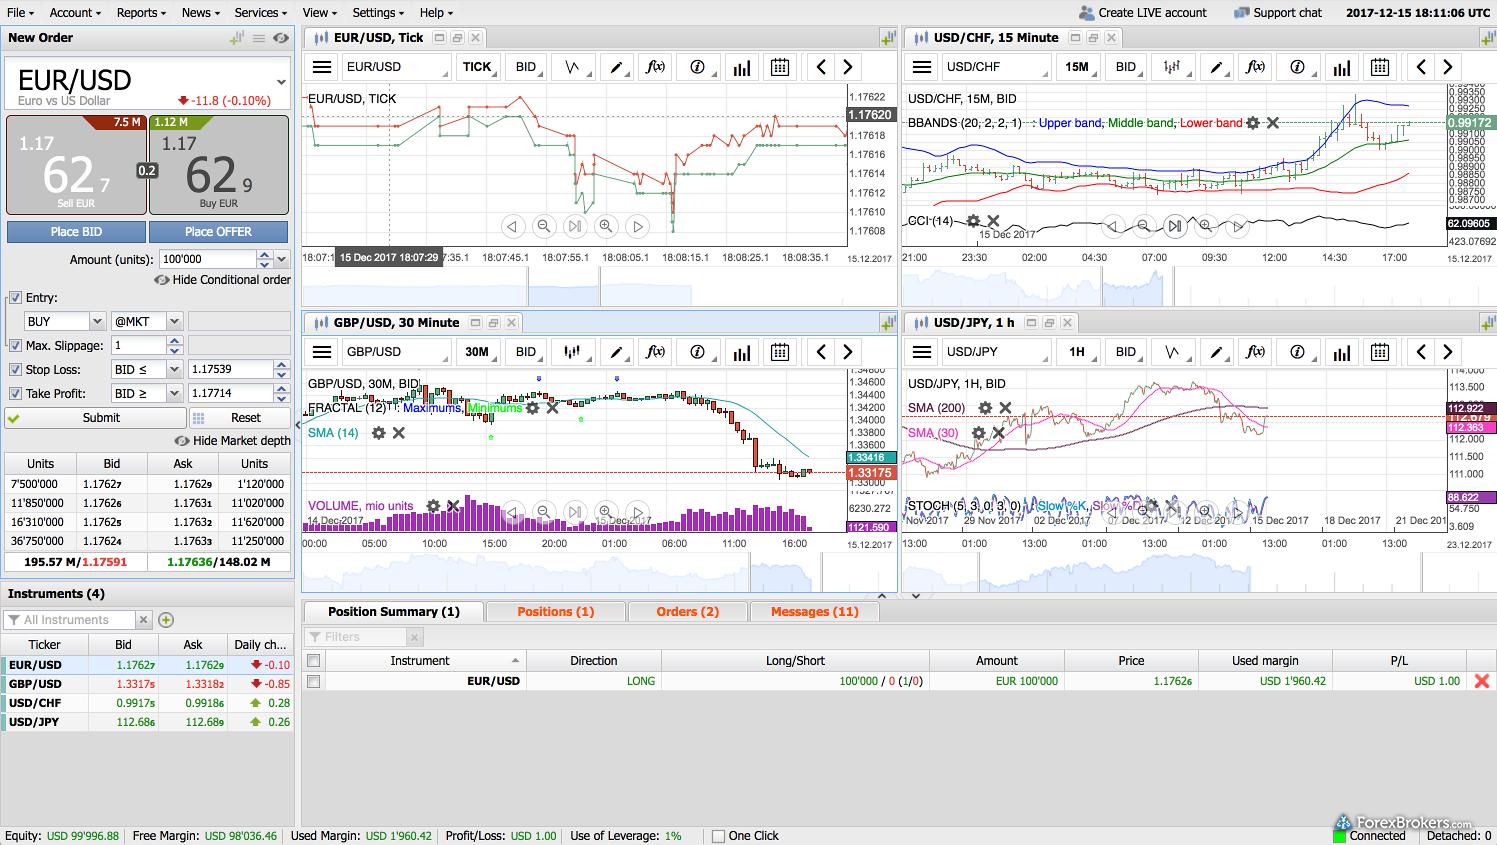 Dukascopy Bank JForex3 web platform